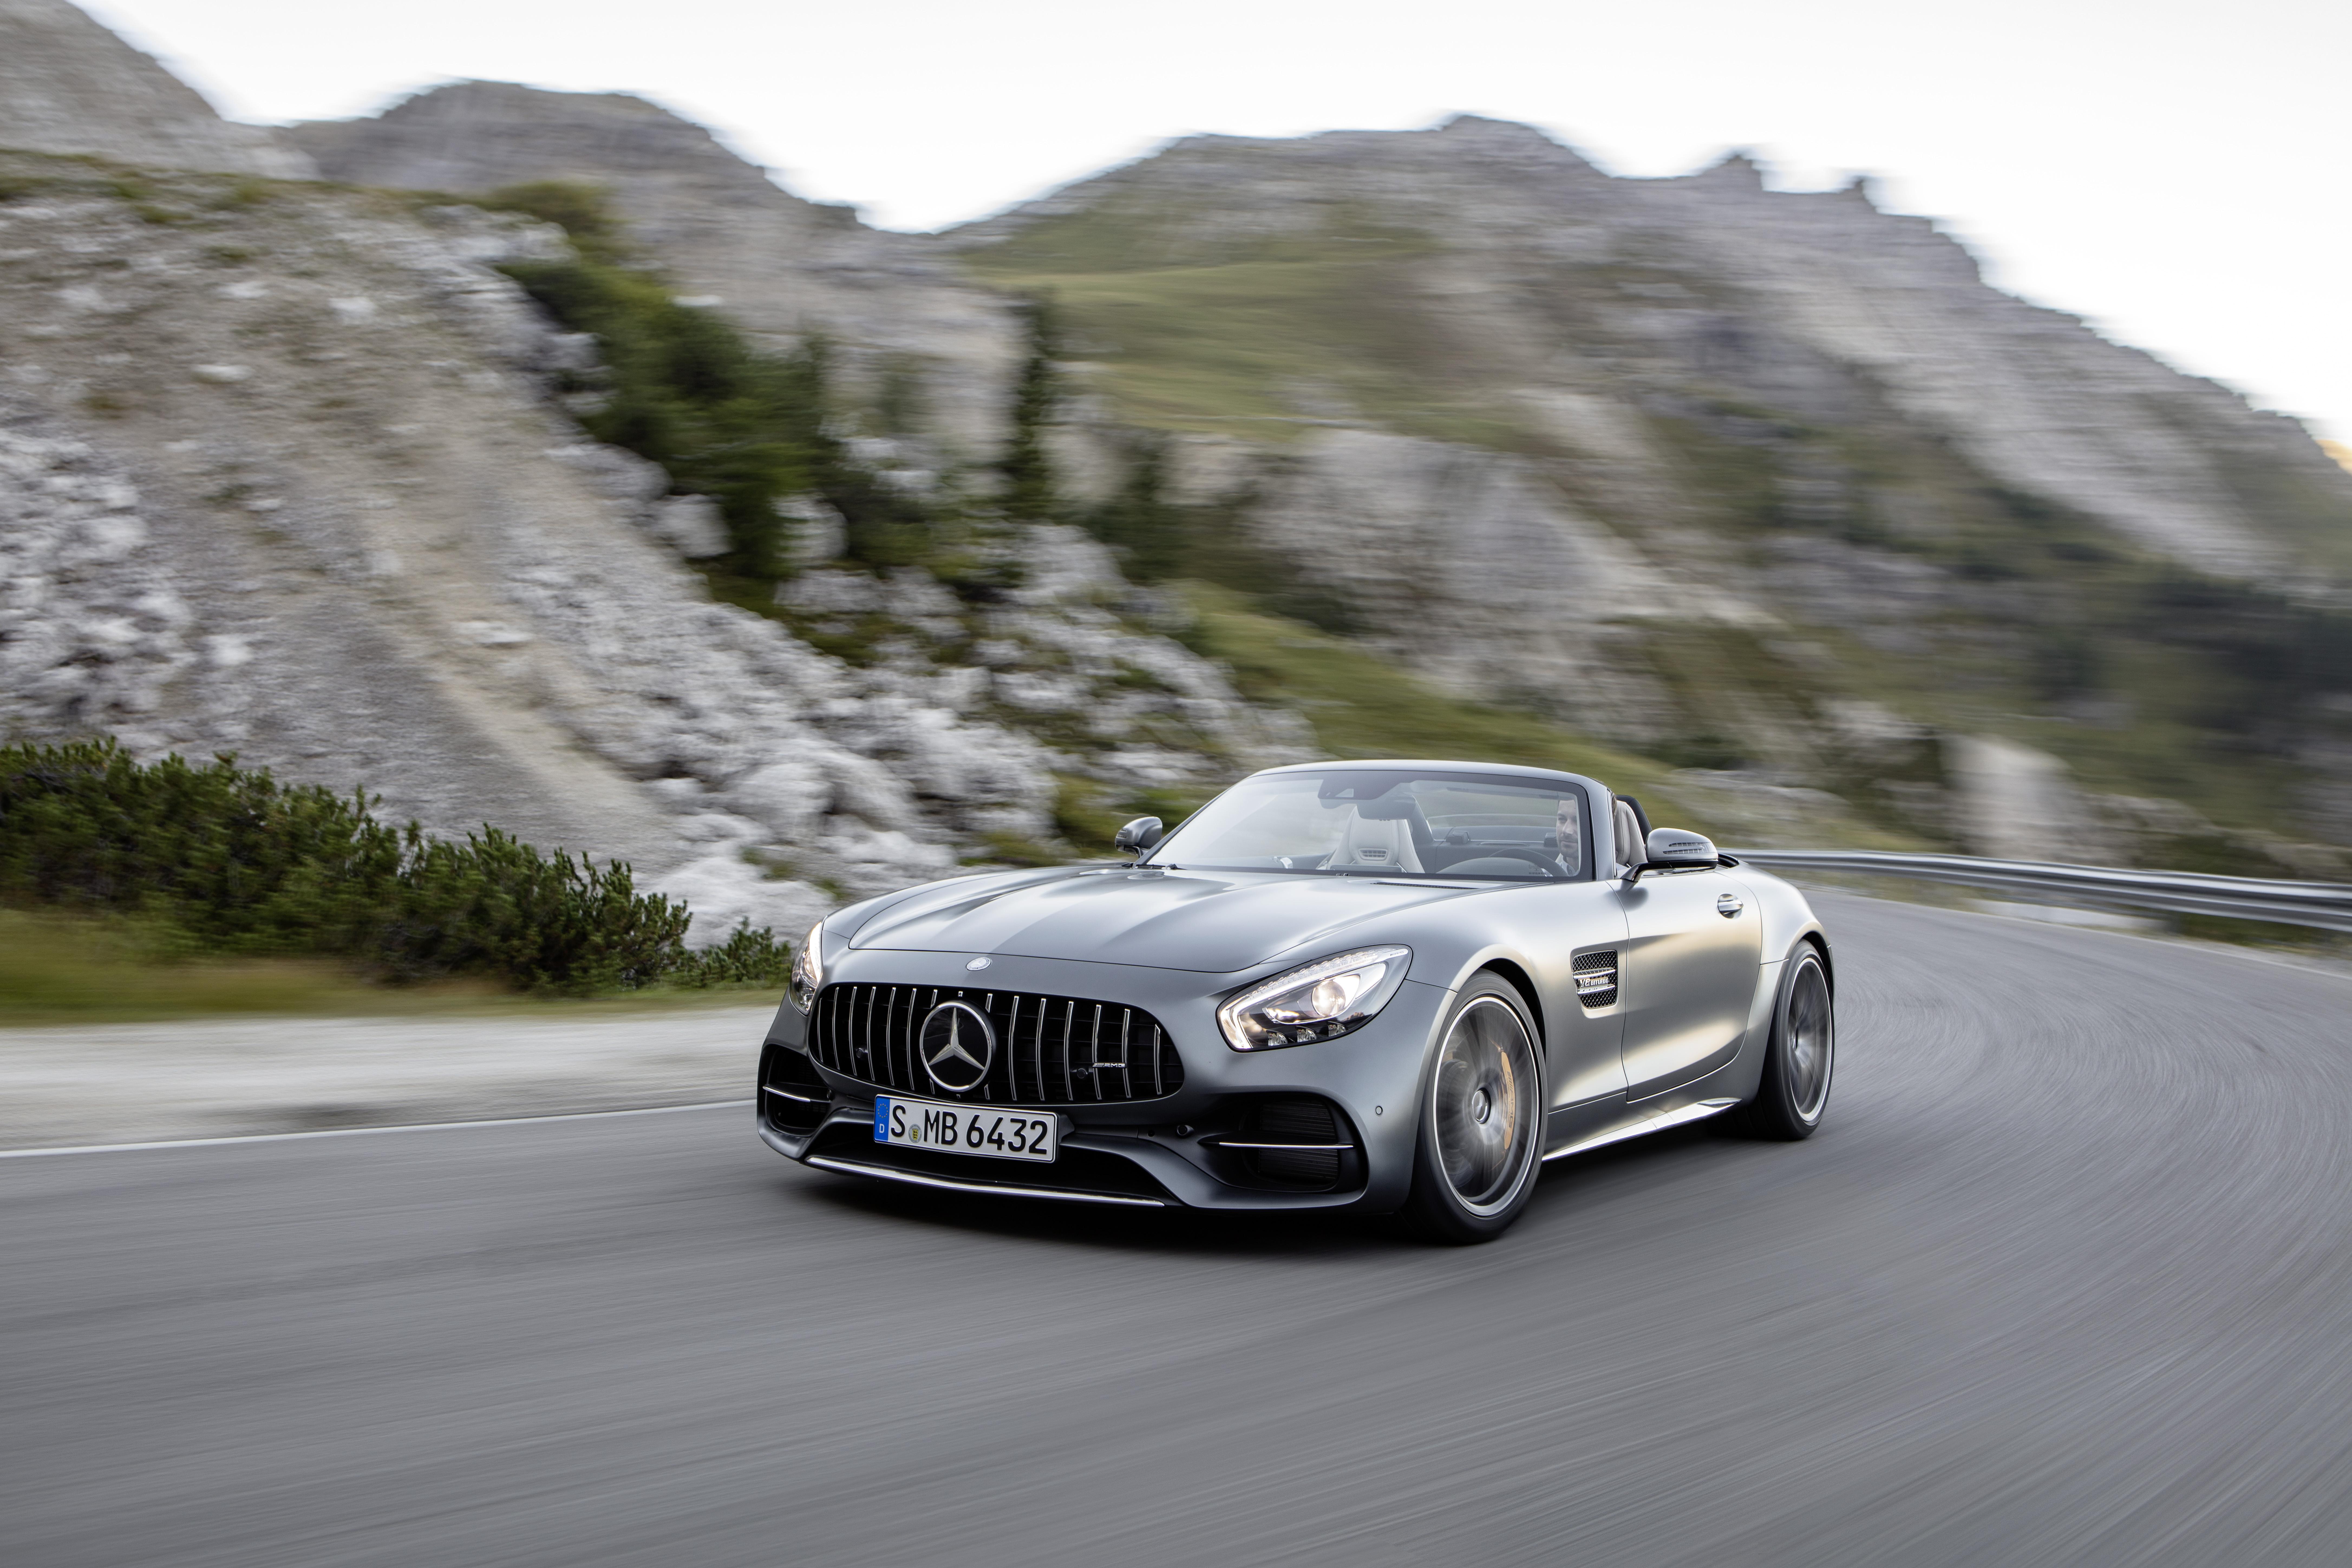 The New Mercedes Amg Gt Roadster Is 469 Horse Of Open Top Ferocity Verge